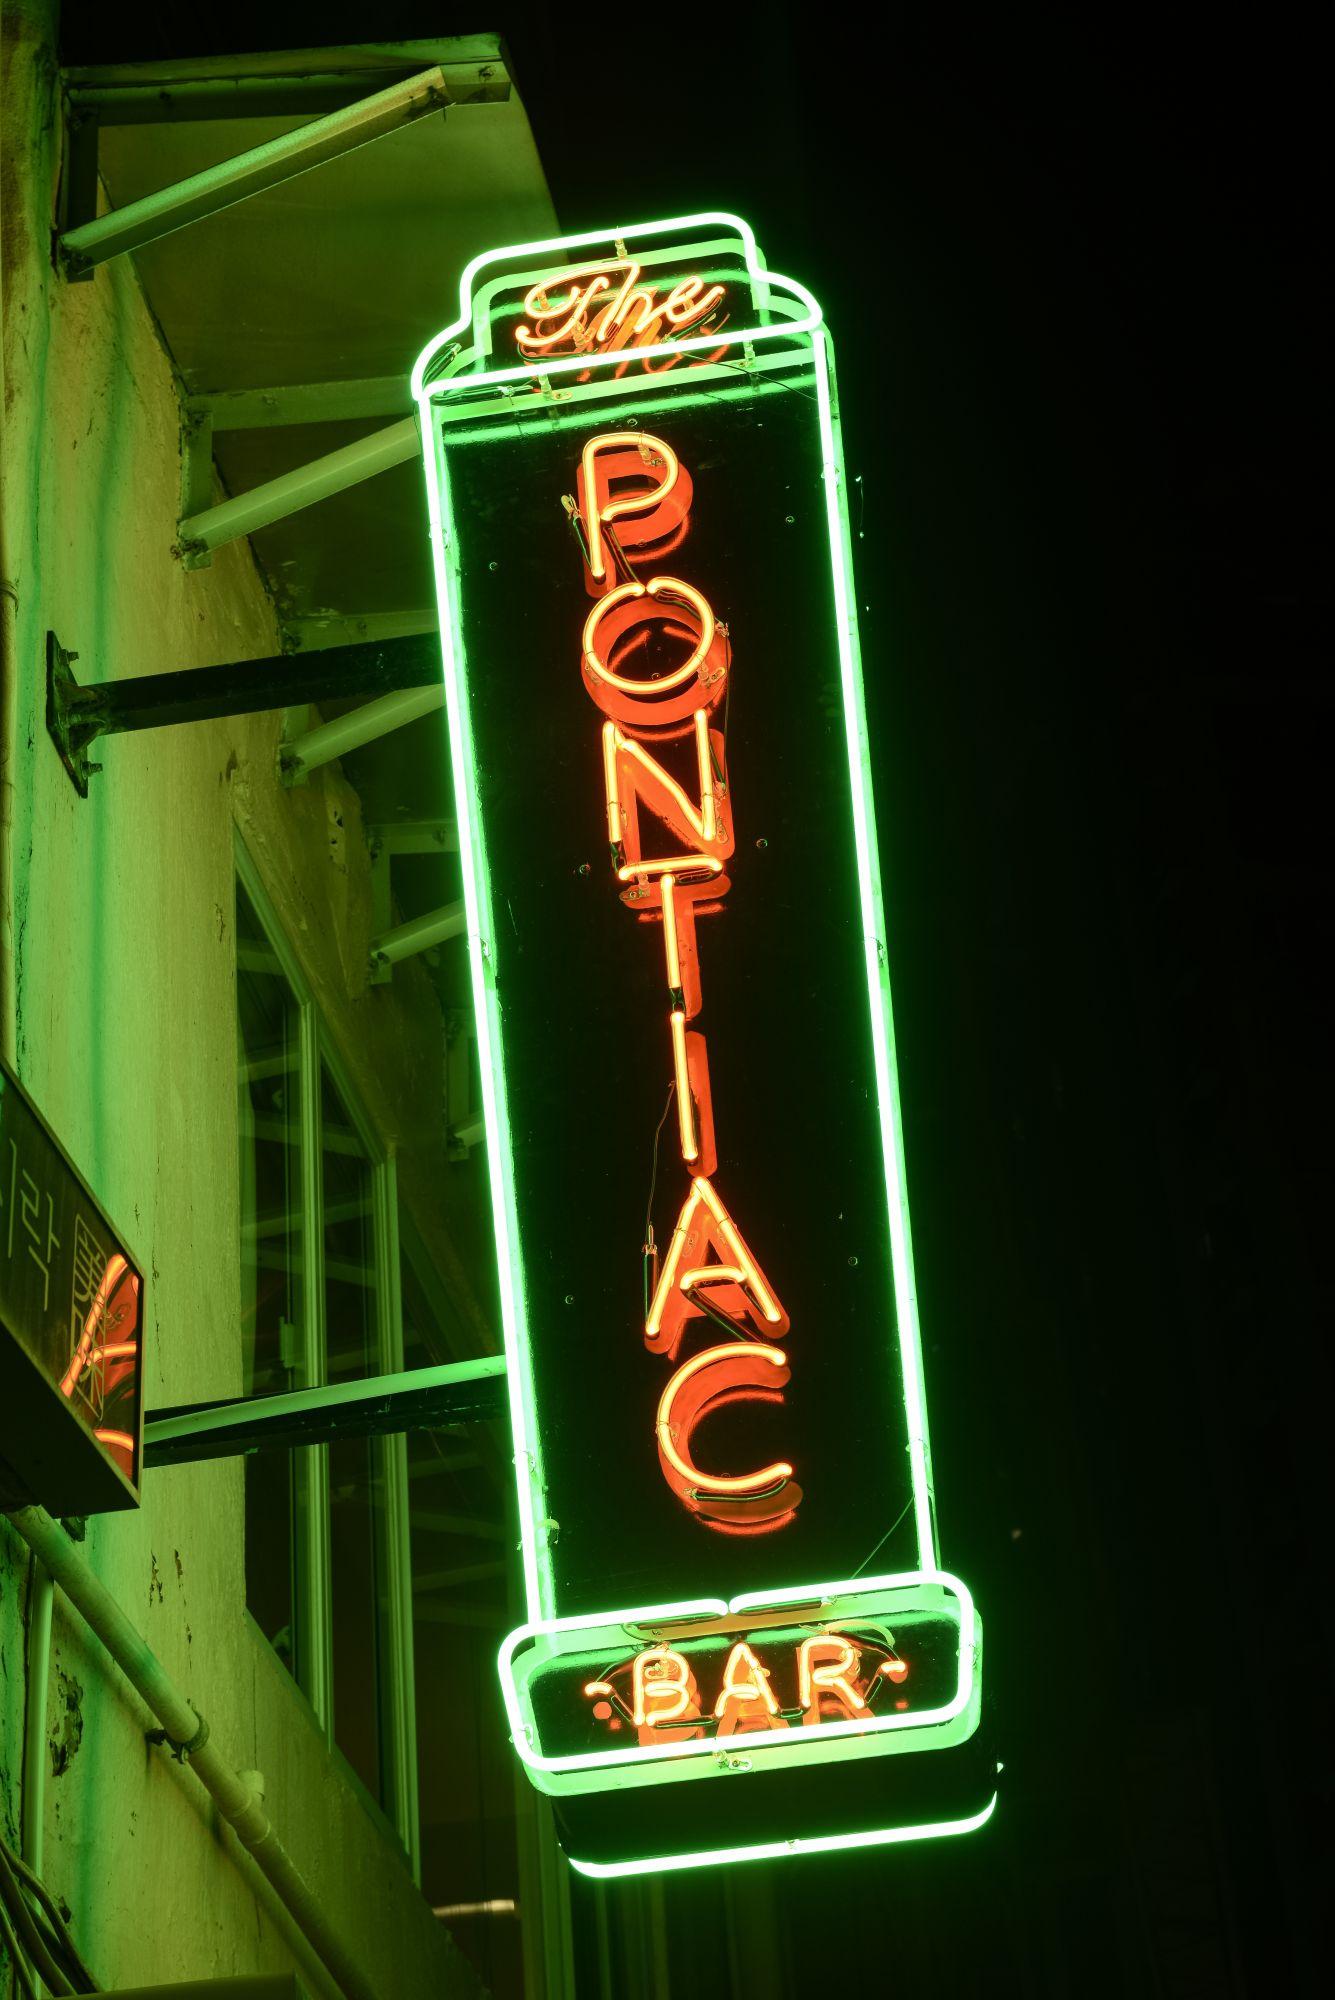 Photo: Courtesy of Pontiac